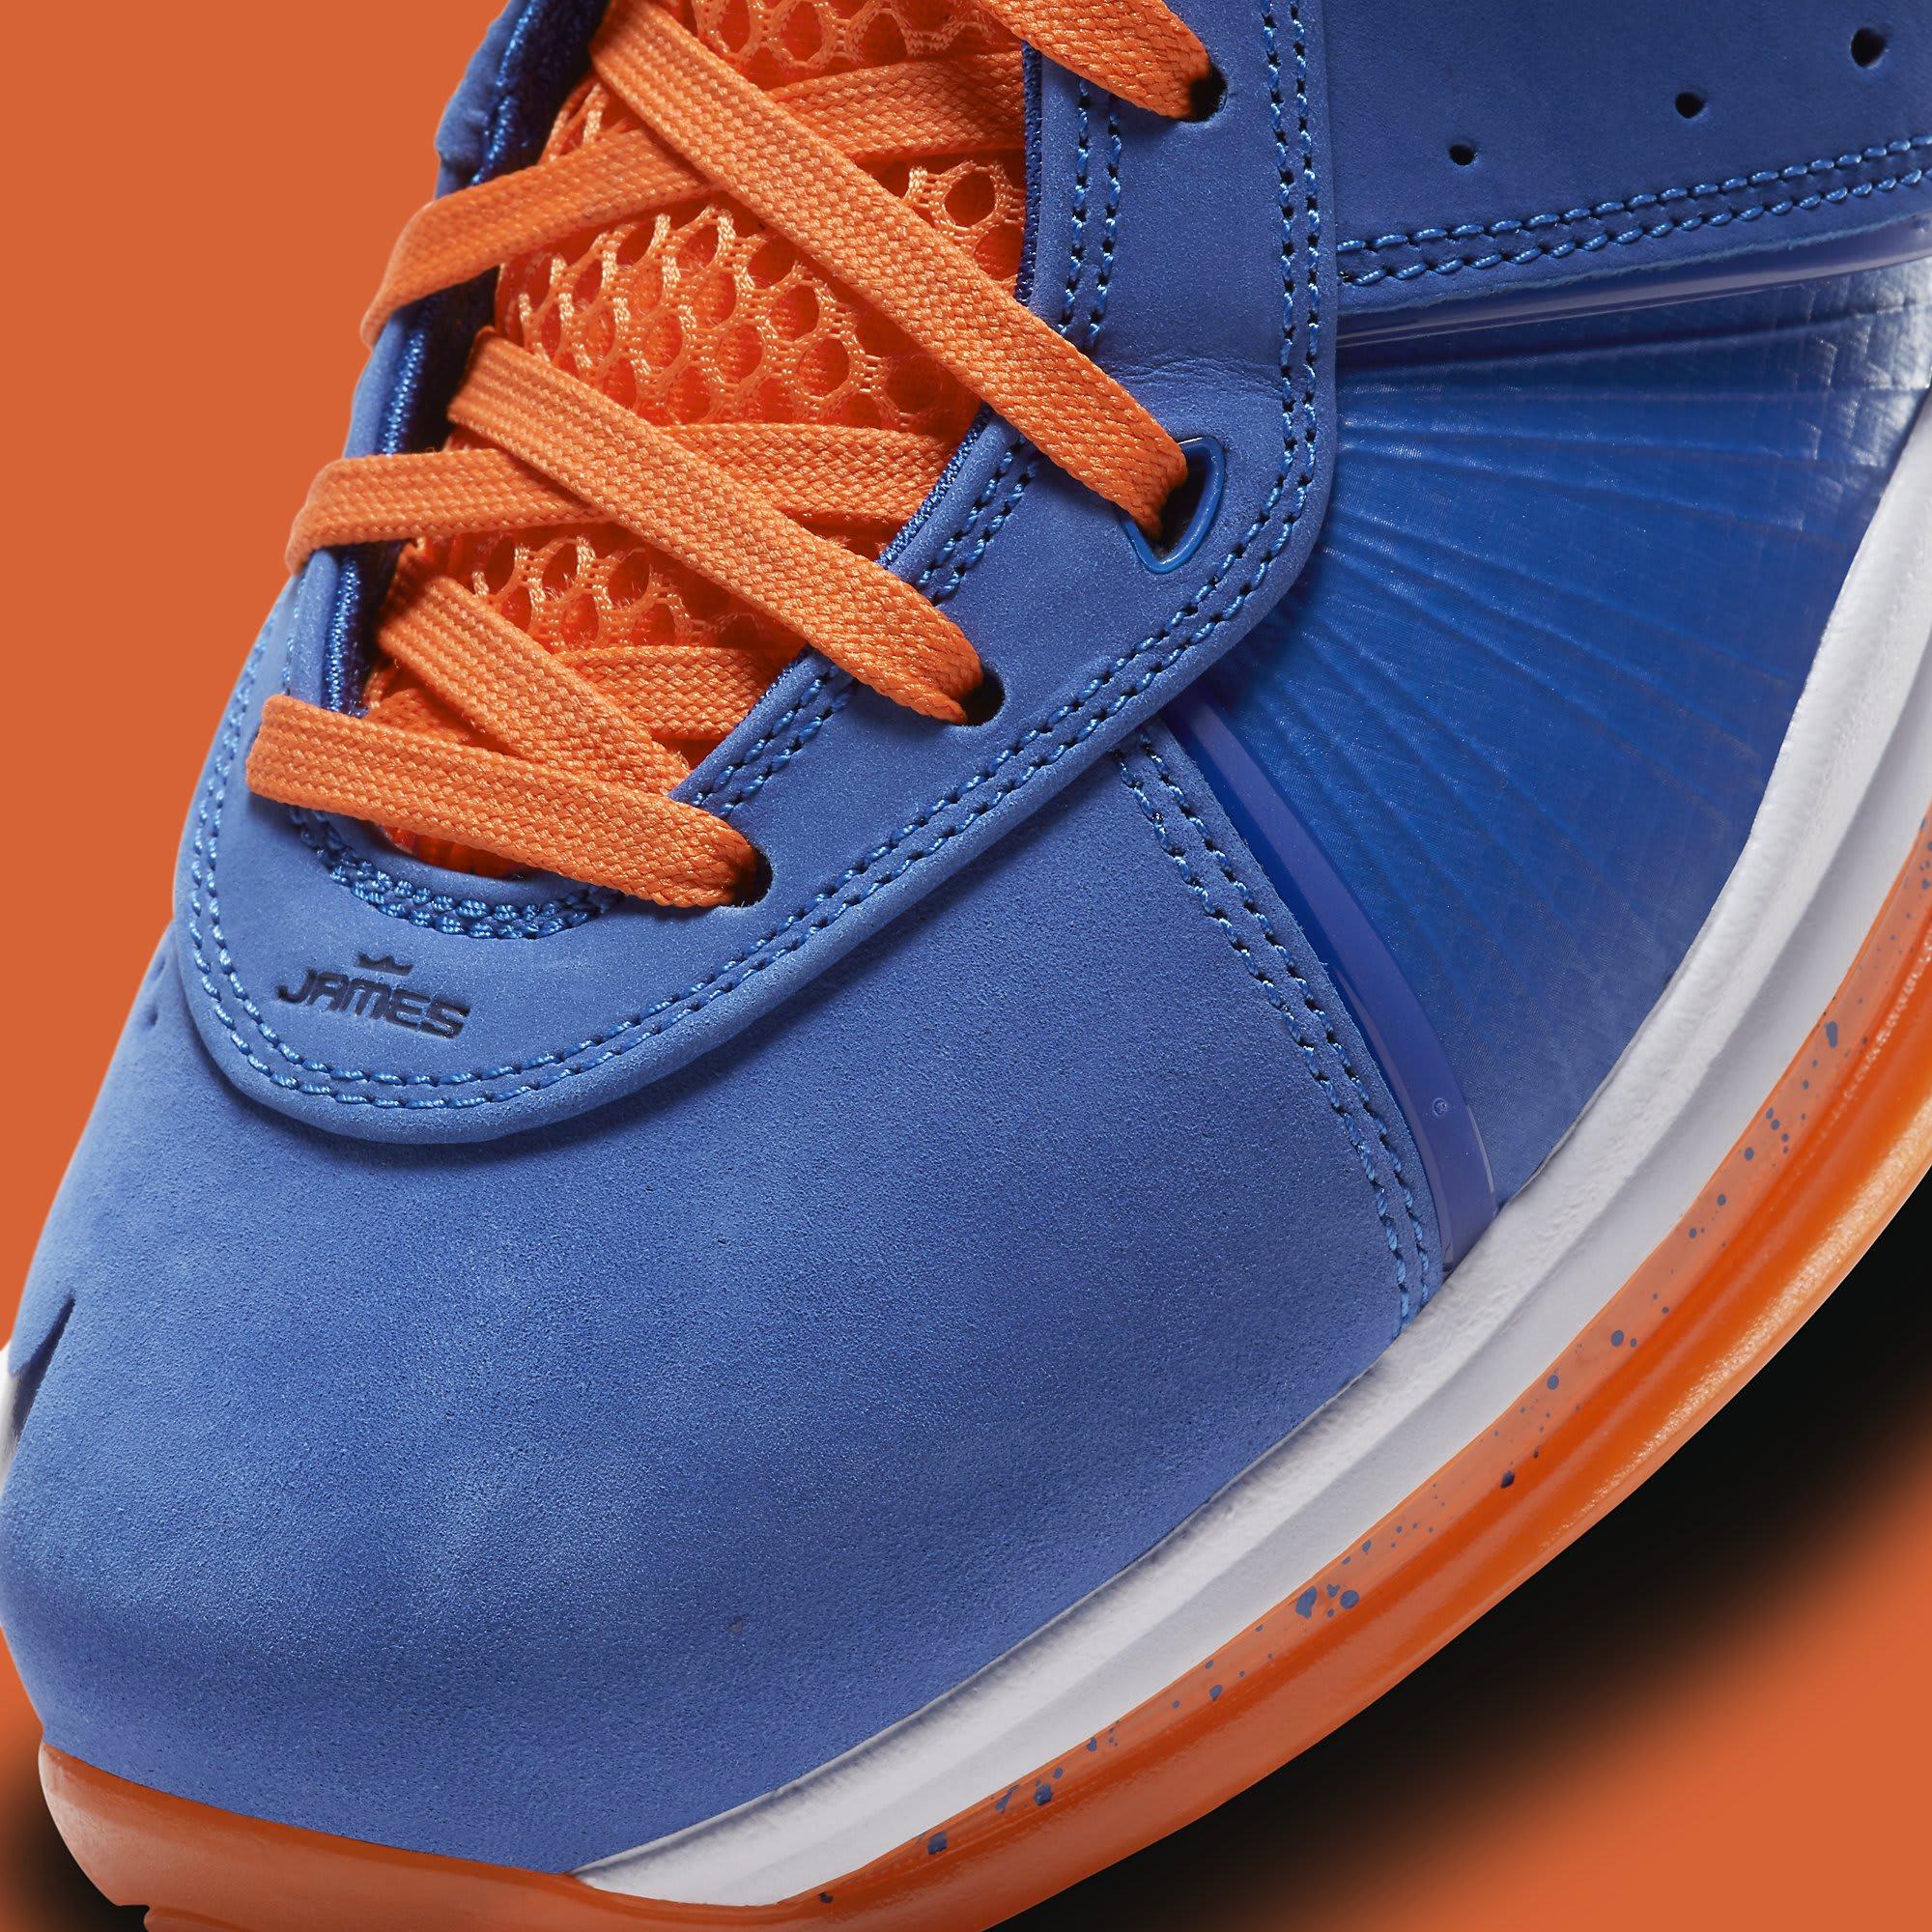 Nike LeBron 8 'HWC' CV1750-400 Toe